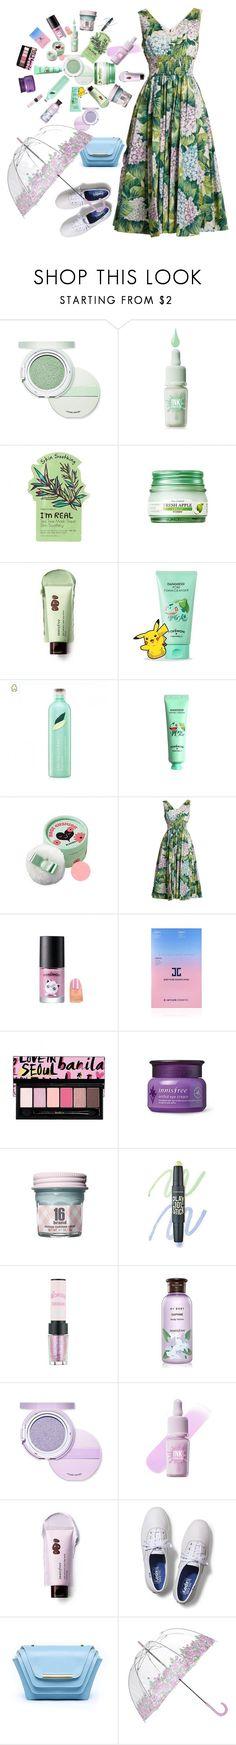 """HEAT-BEAUTY STROKE🌞"" by elen25 ❤ liked on Polyvore featuring beauty, Etude House, peripera, Innisfree, TONYMOLY, The Face Shop, Dolce&Gabbana, JayJun, Keds and Ellia Wang"